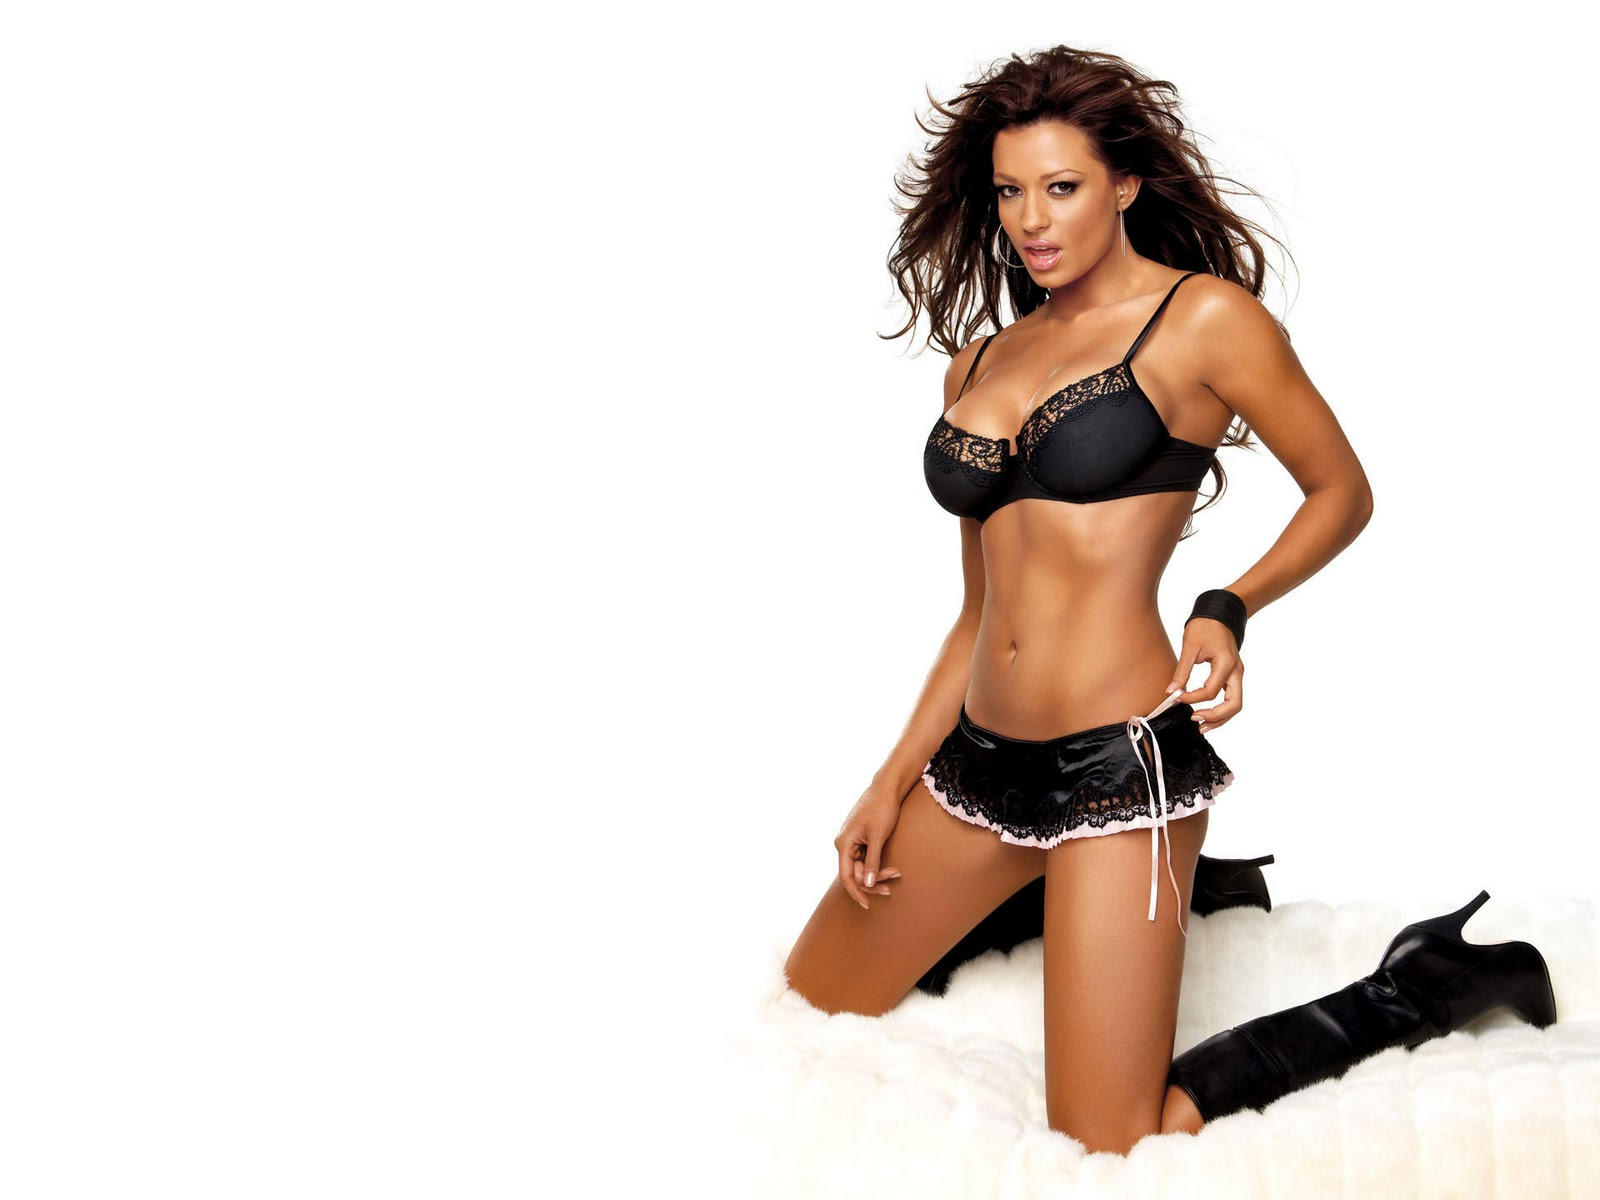 Candice Michelle Porn Man - Candice michelle photos hot - Adult videos